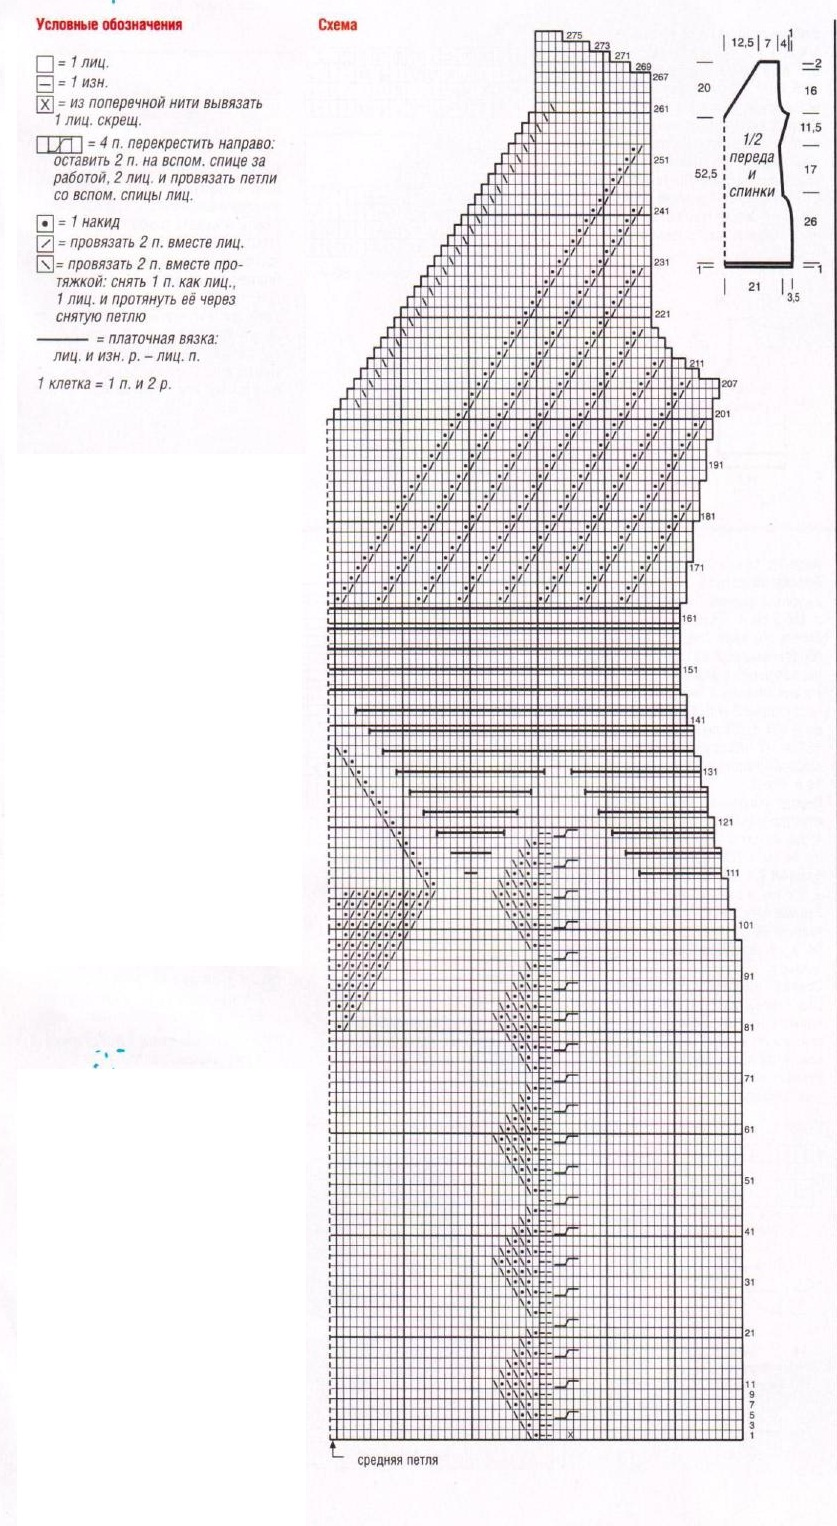 Бежевая туника вязаная спицами схема